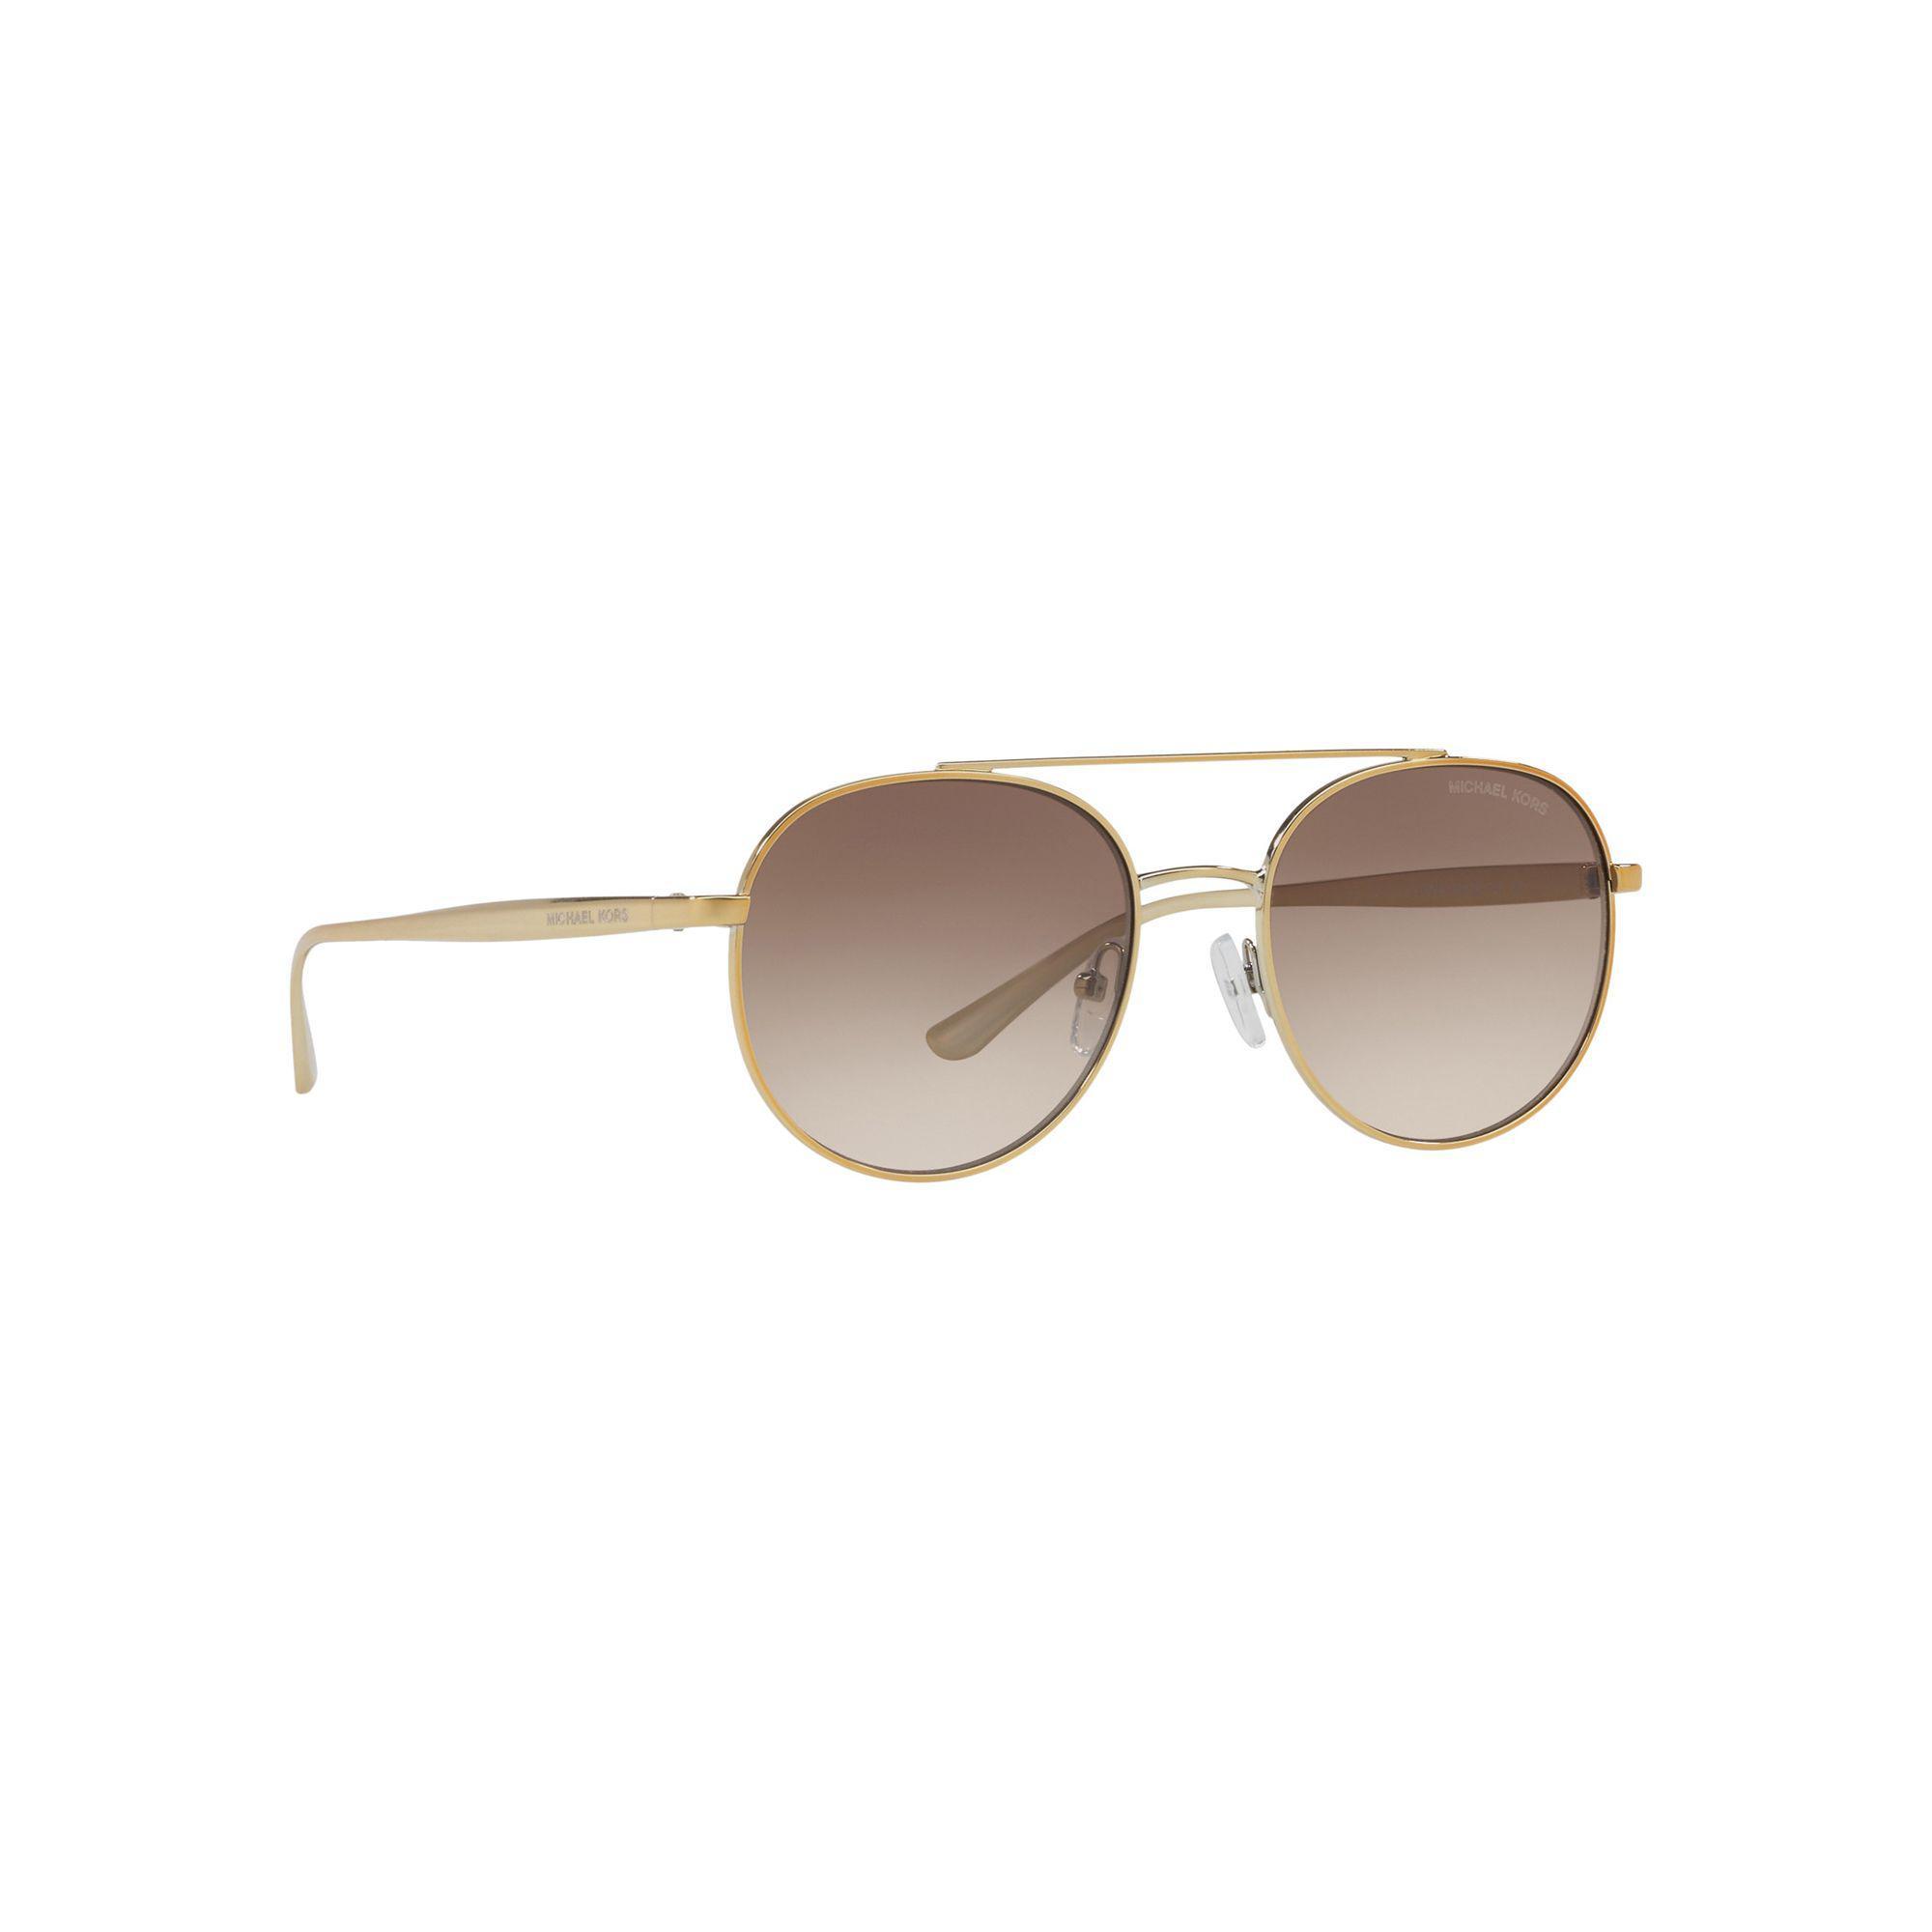 8aac7dc4f Michael Kors - Metallic Gold Tone 'lon' Pilot Mk1021 Sunglasses - Lyst.  View fullscreen